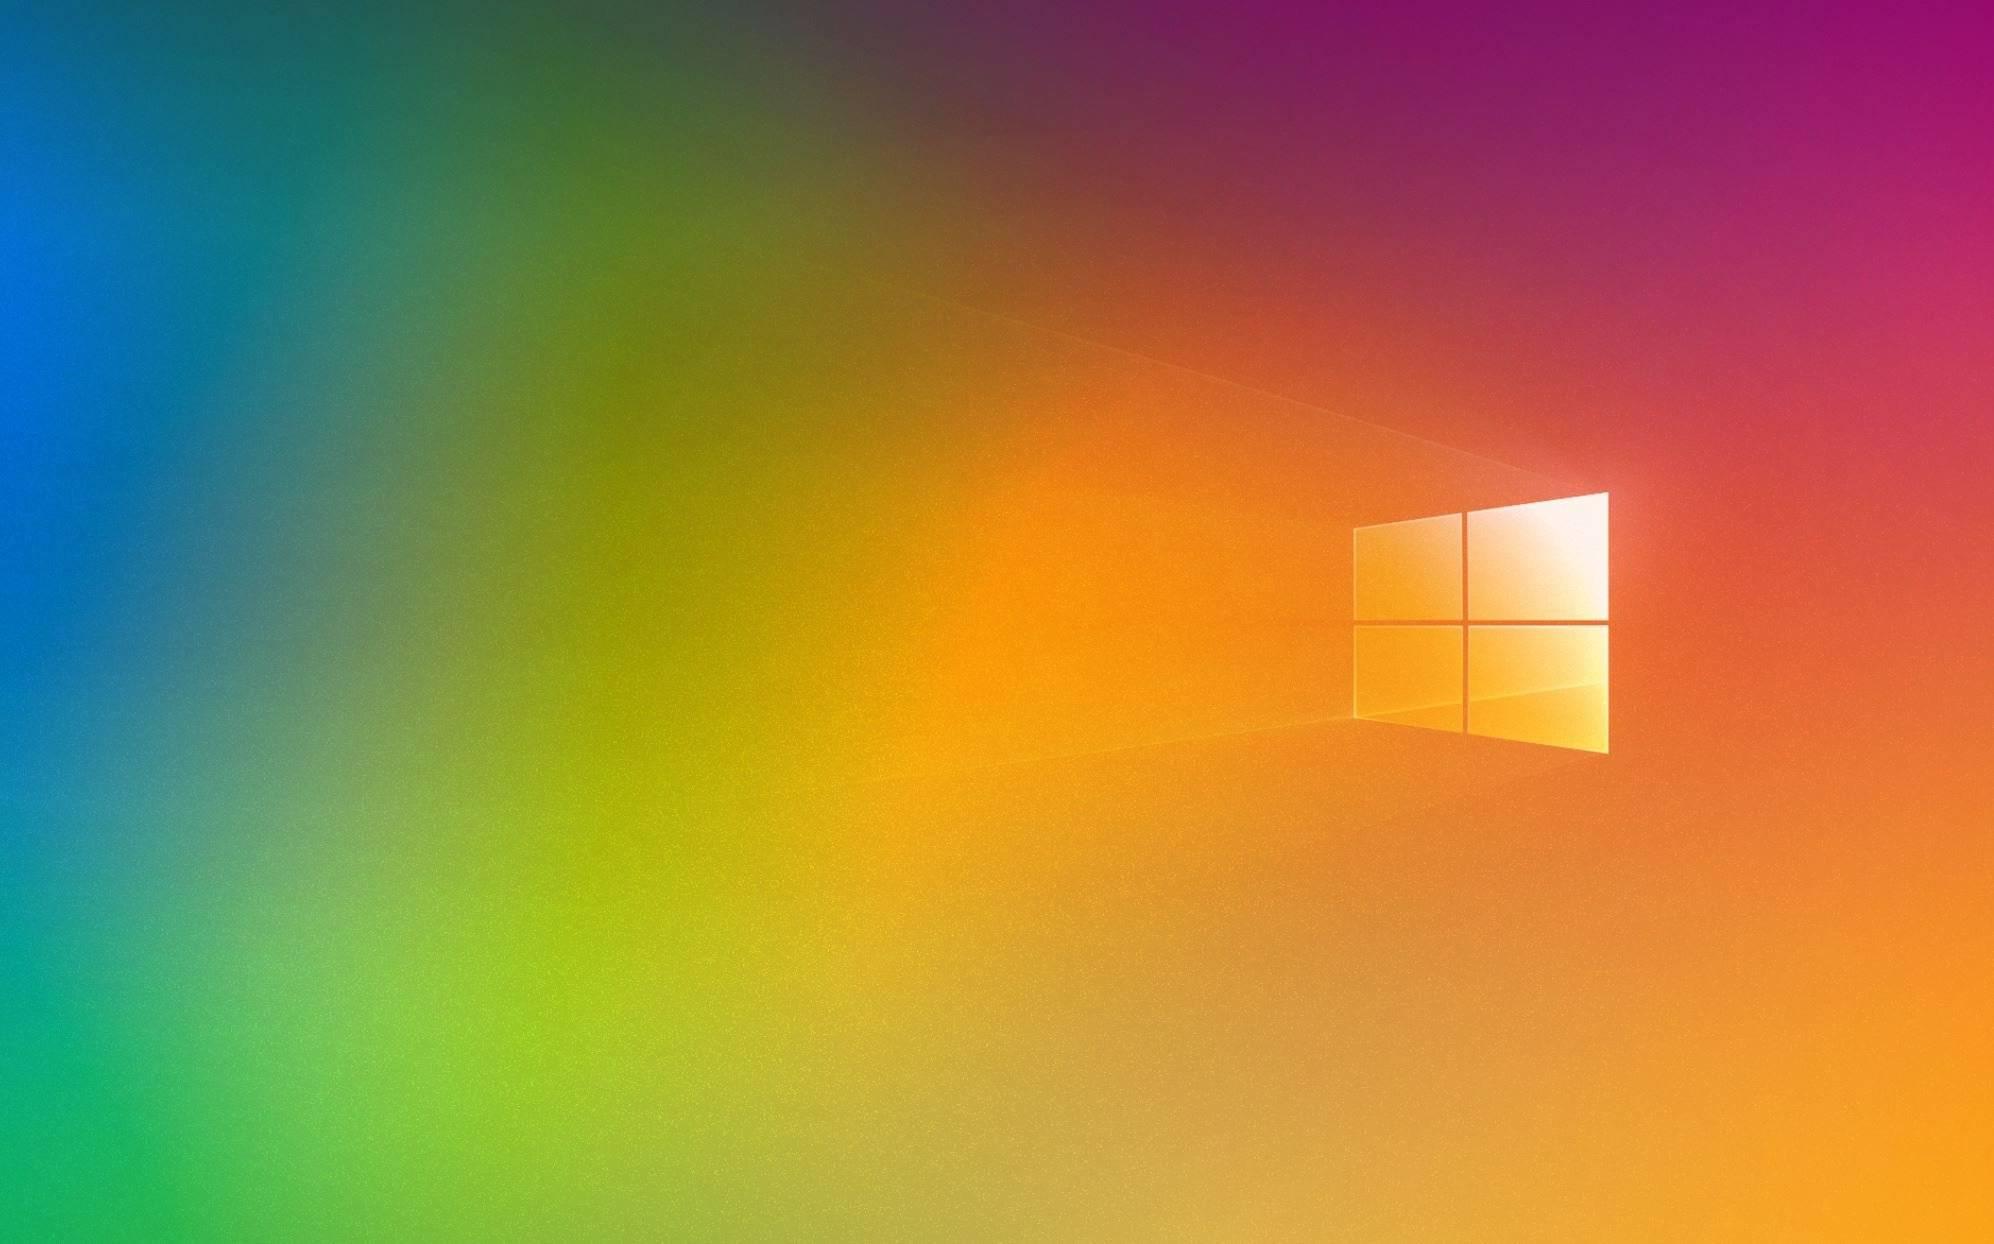 Windows-10-Version-20H2